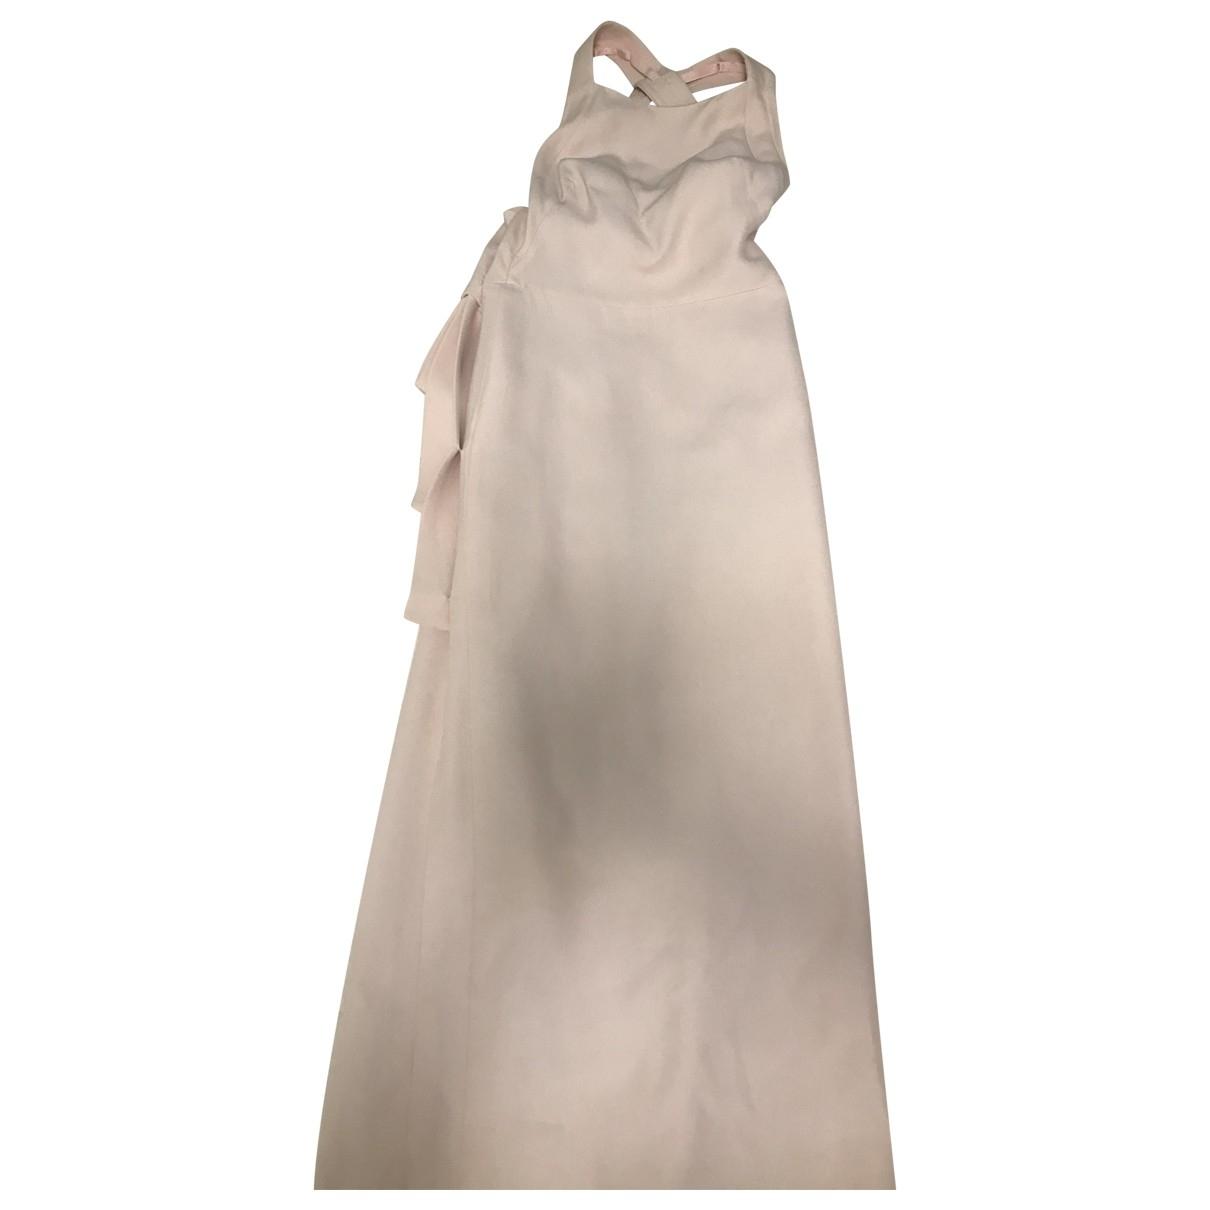 Prada \N Pink dress for Women 40 FR